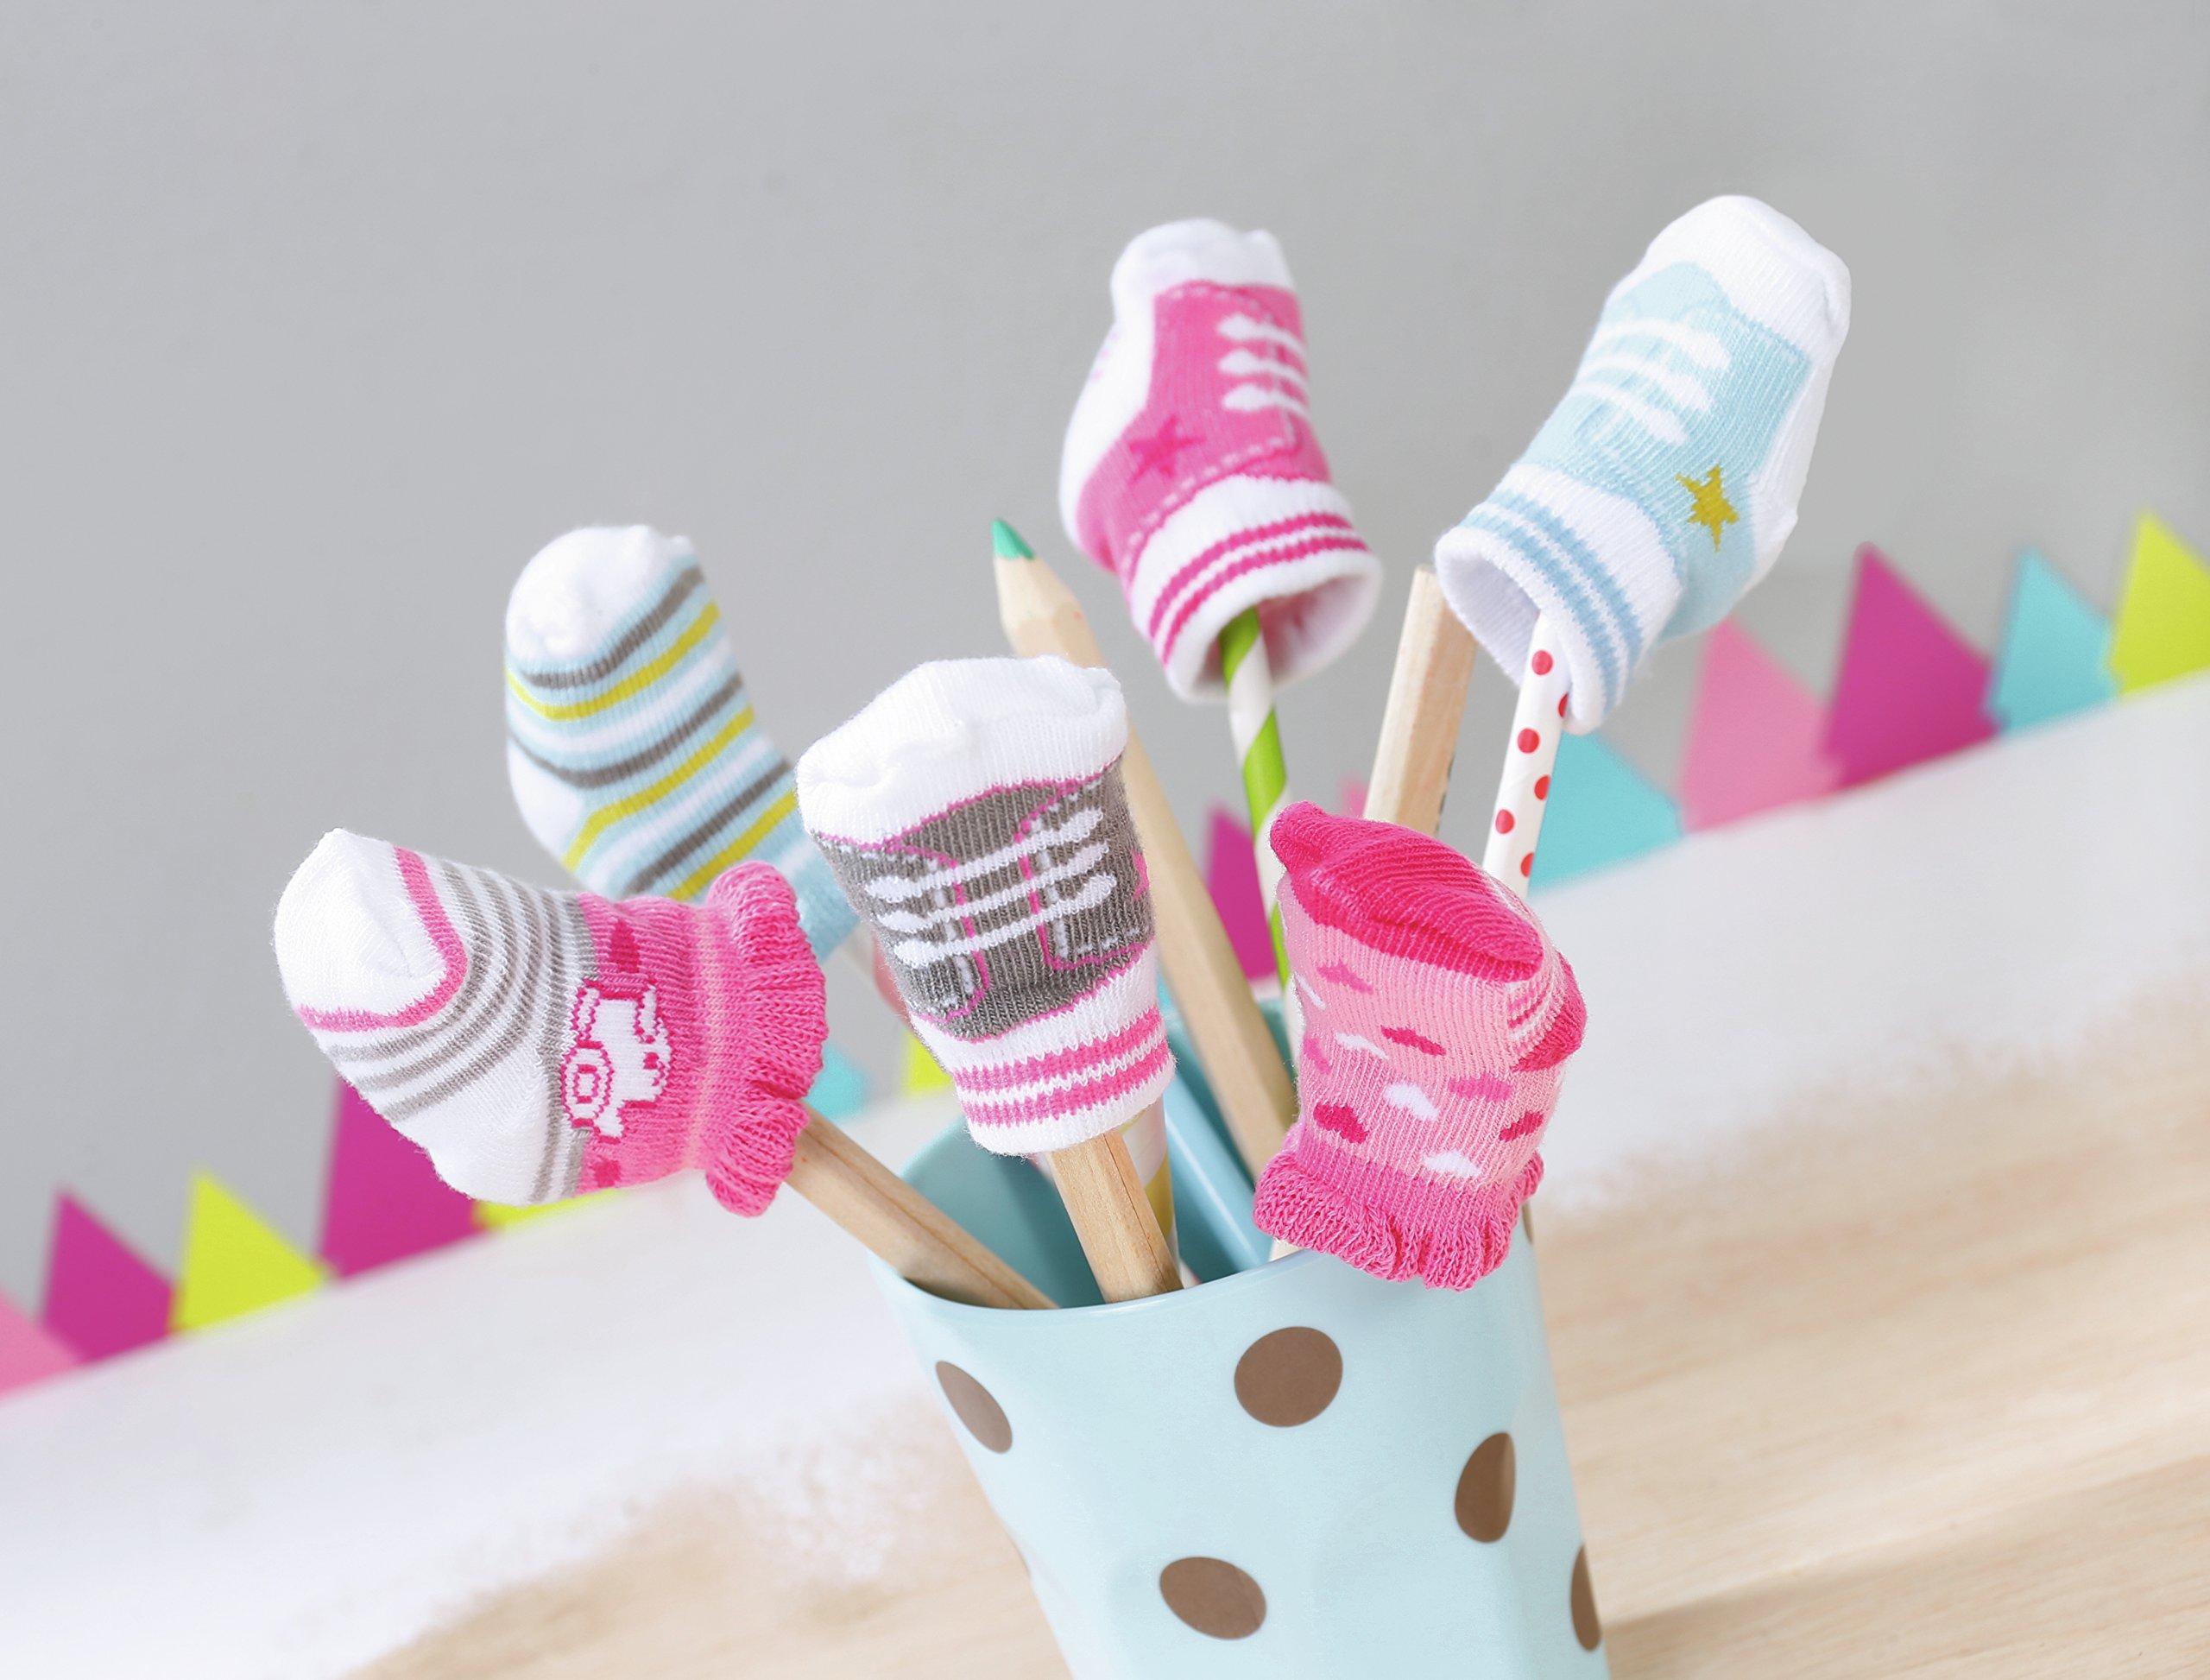 BABY born Socks, 2 pack Calcetines de muñeca - Accesorios para muñecas (2 pack, Calcetines de muñeca, 3 año(s… 3